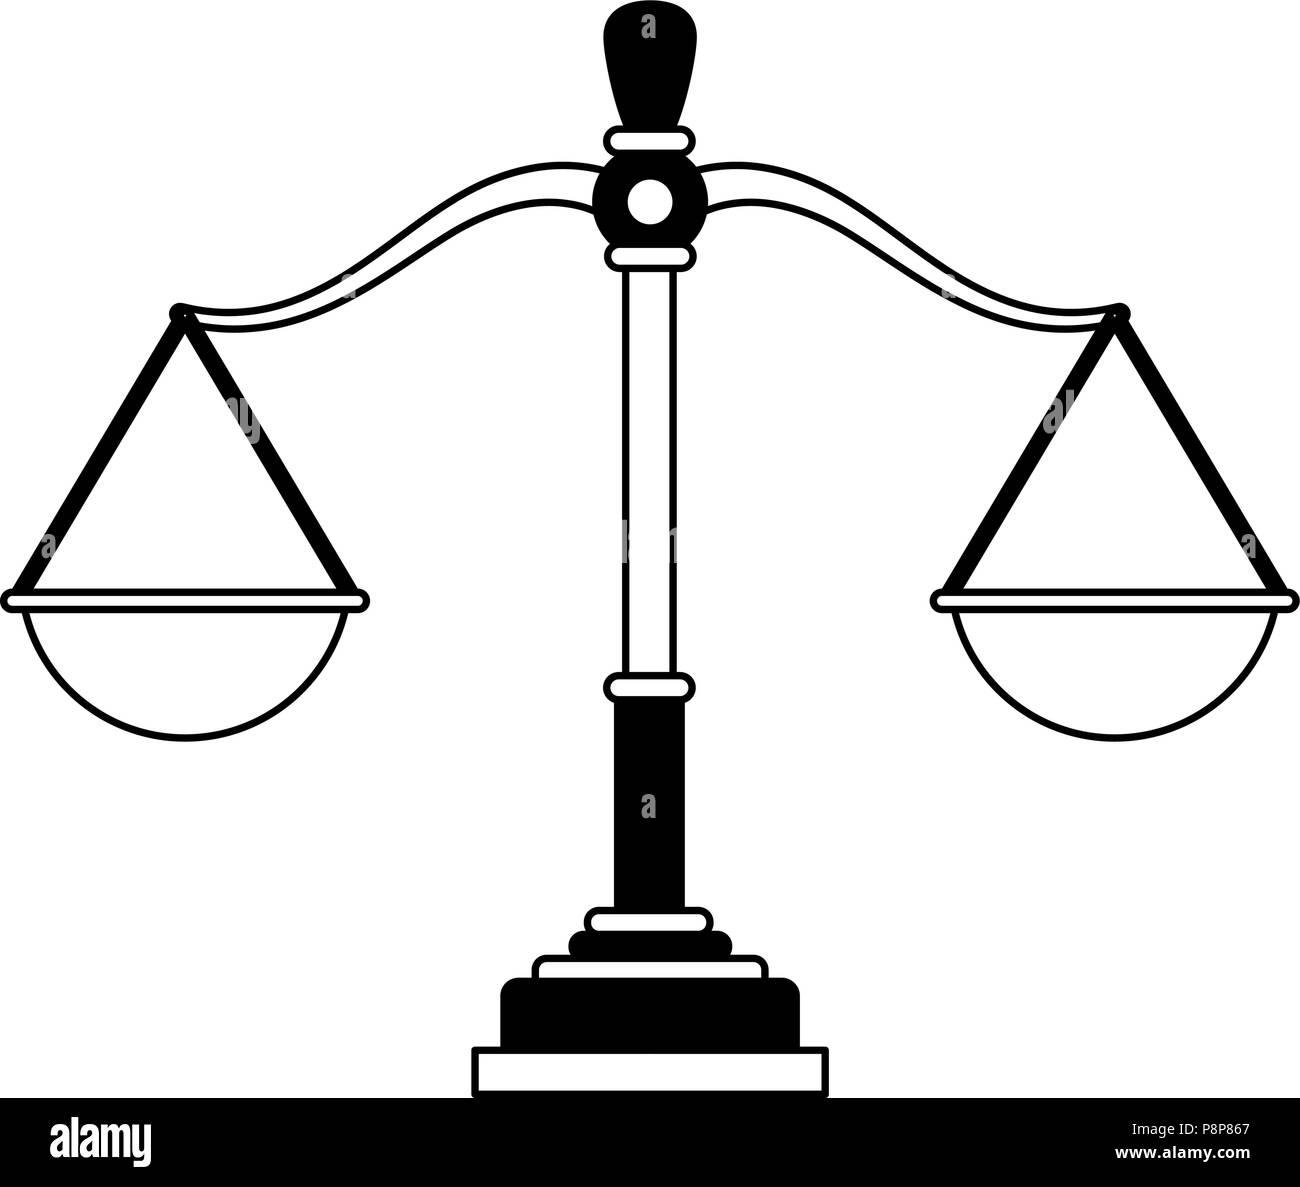 Justice balance symbol black and white - Stock Image